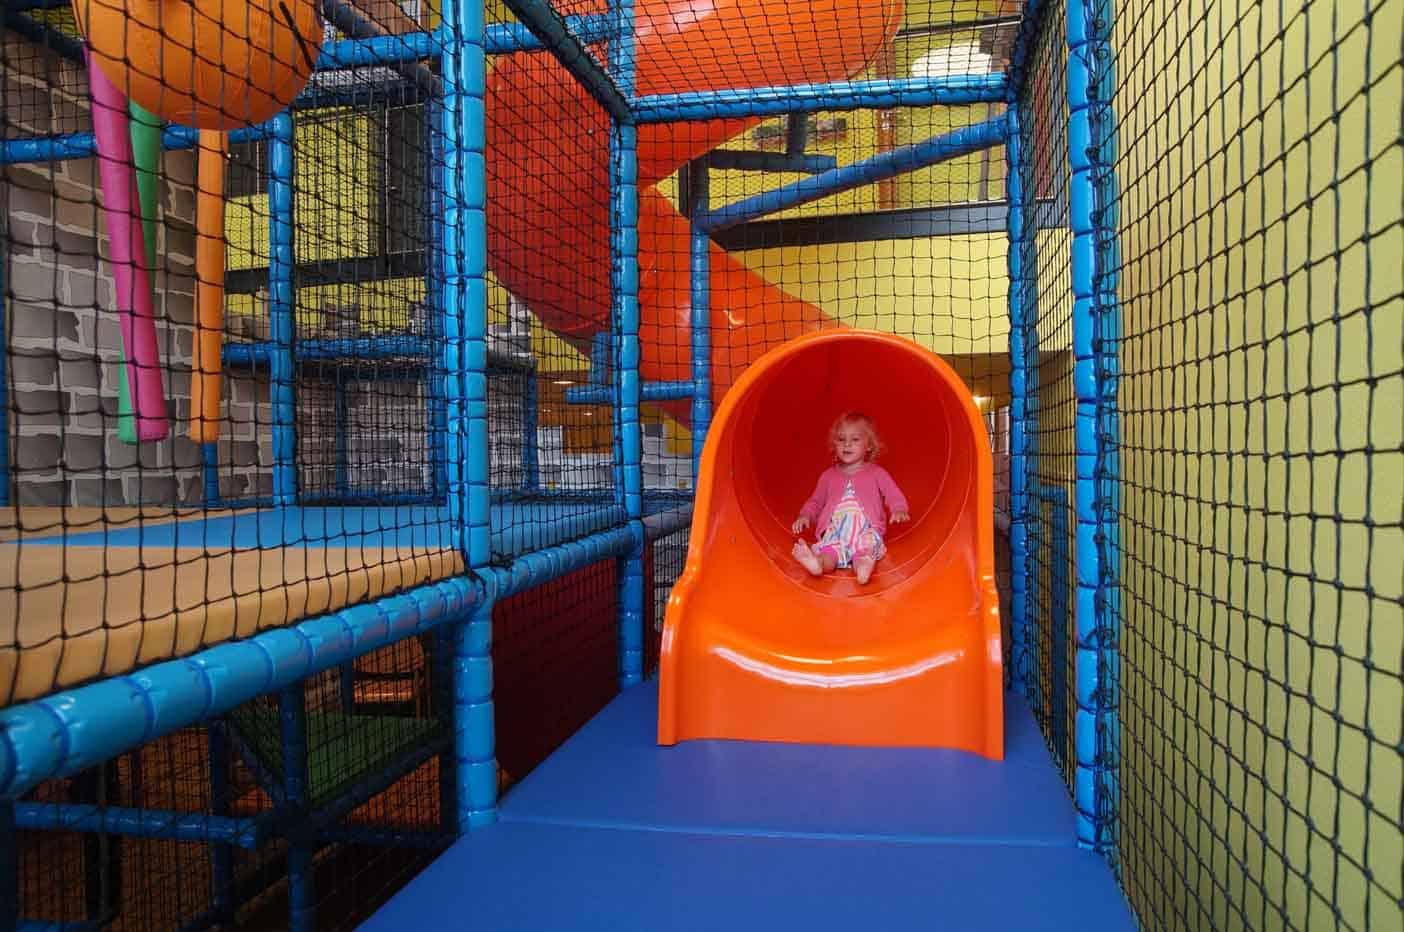 Jeugdherberg Beaufort playground